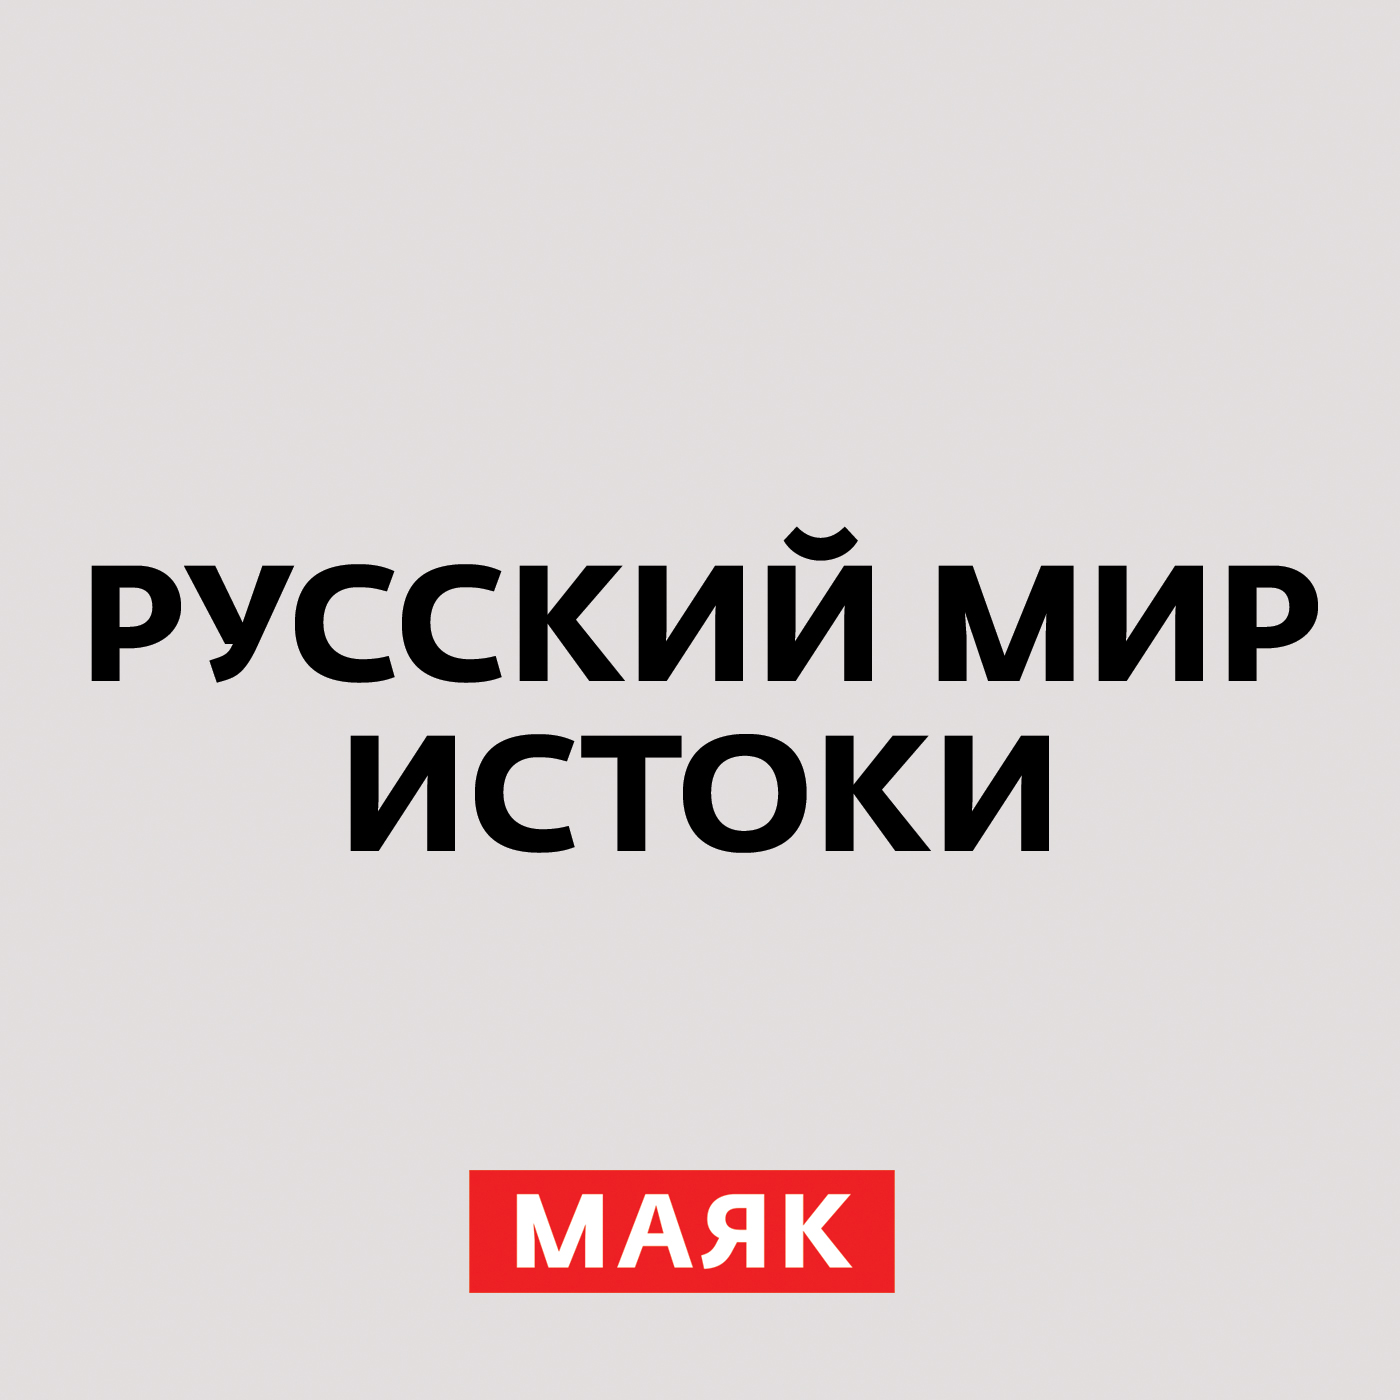 Творческий коллектив радио «Маяк» Великий князь Ярополк и князь Владимир творческий коллектив радио маяк теща